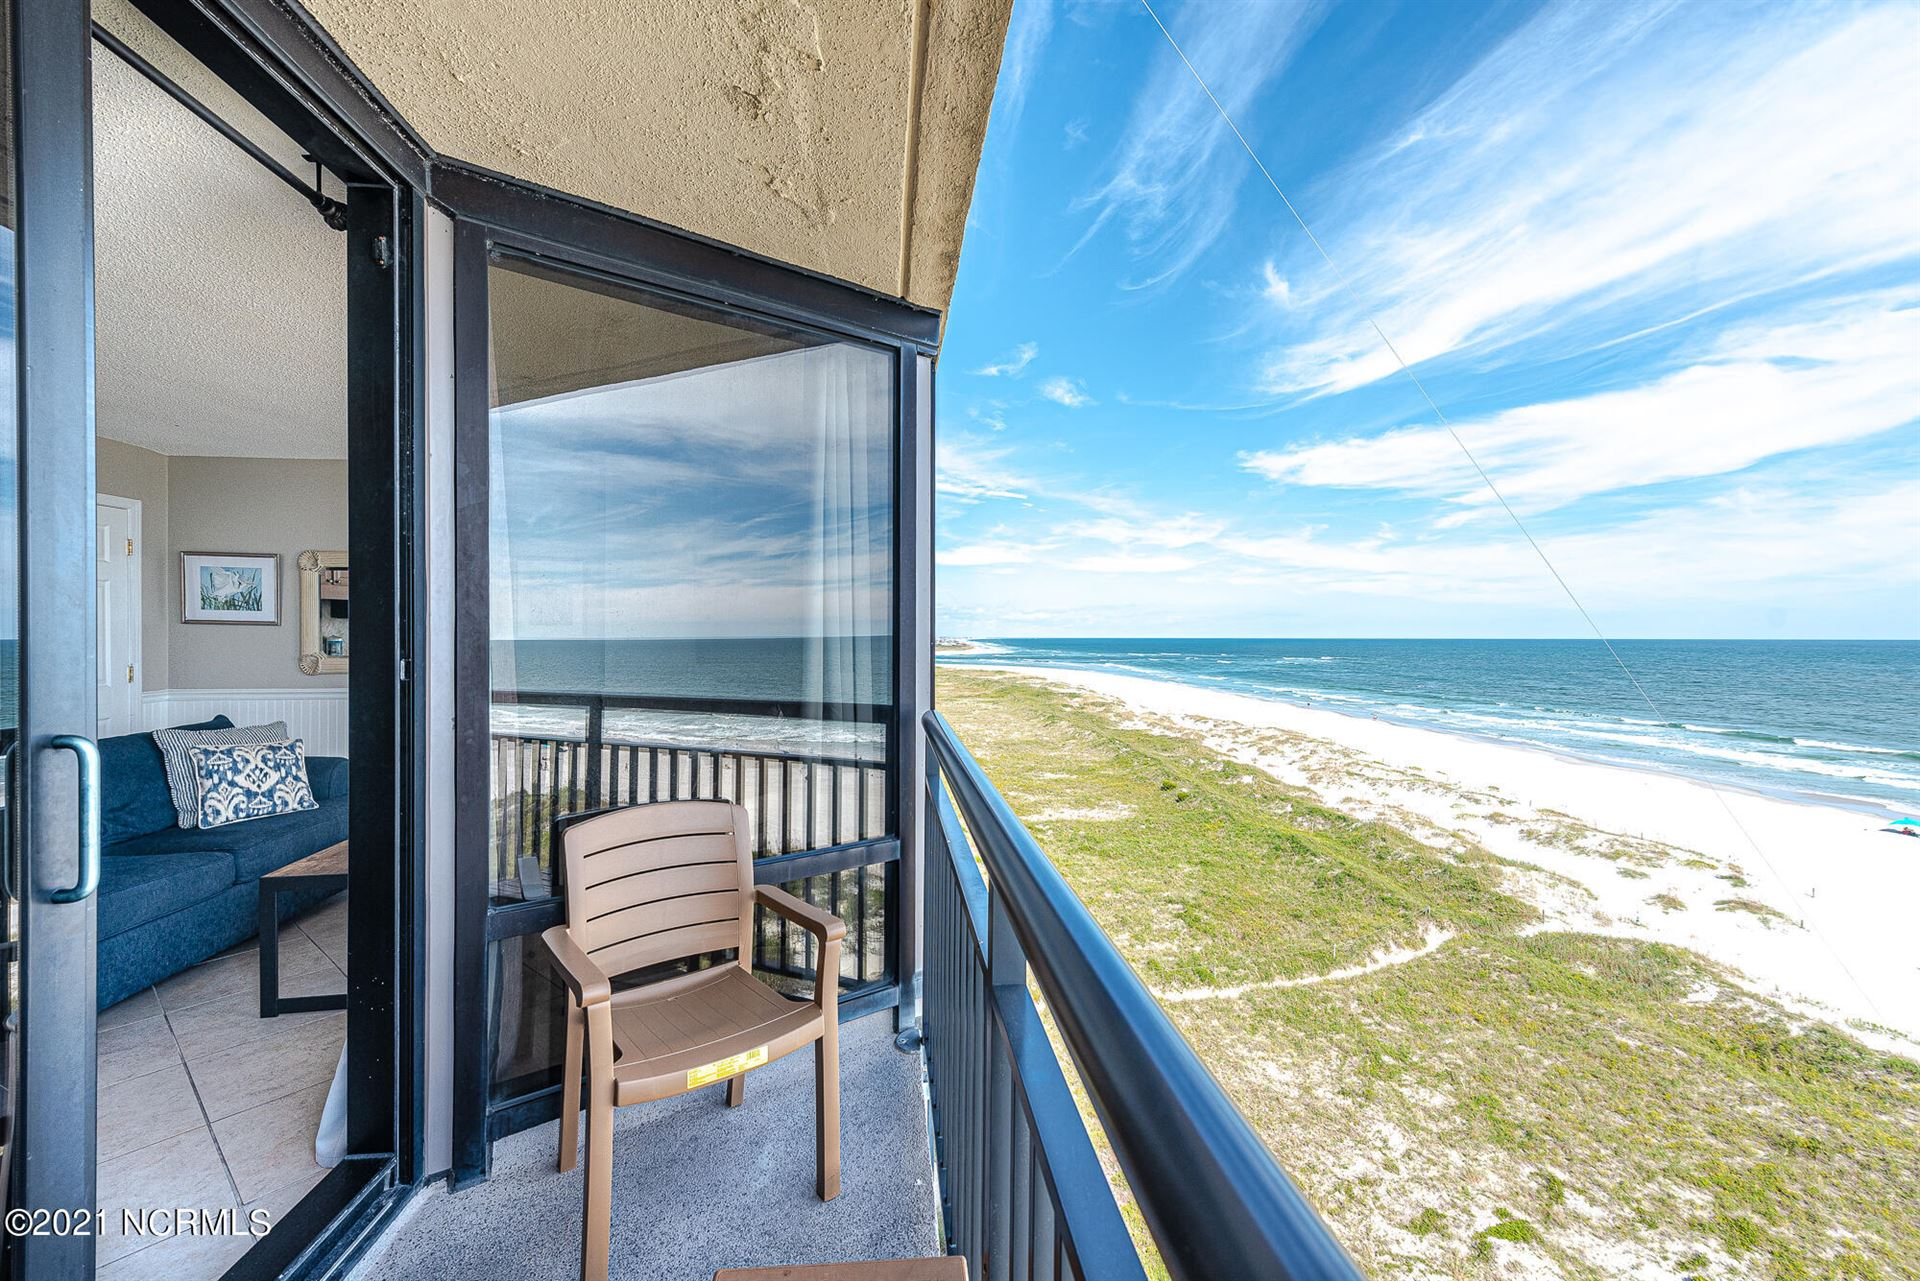 Photo of 2700 N Lumina Avenue #Unit 905, Wrightsville Beach, NC 28480 (MLS # 100293978)